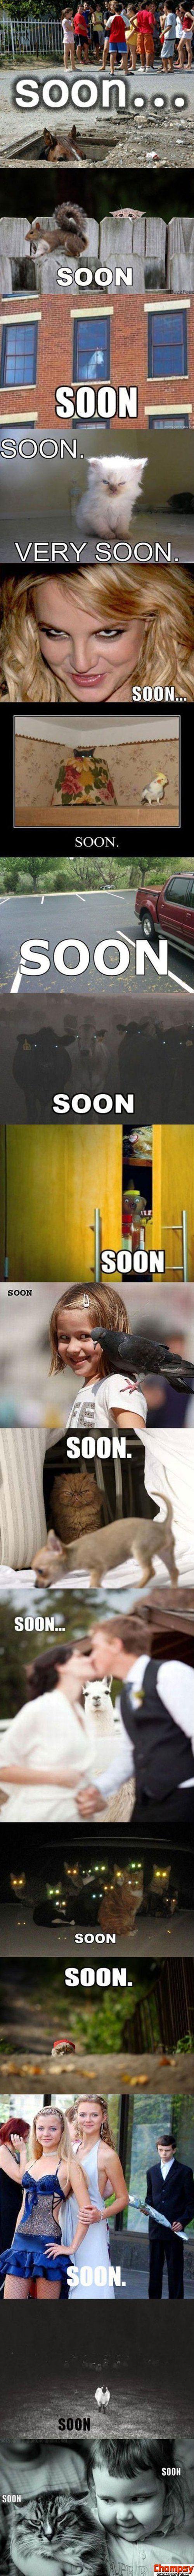 Soon lol